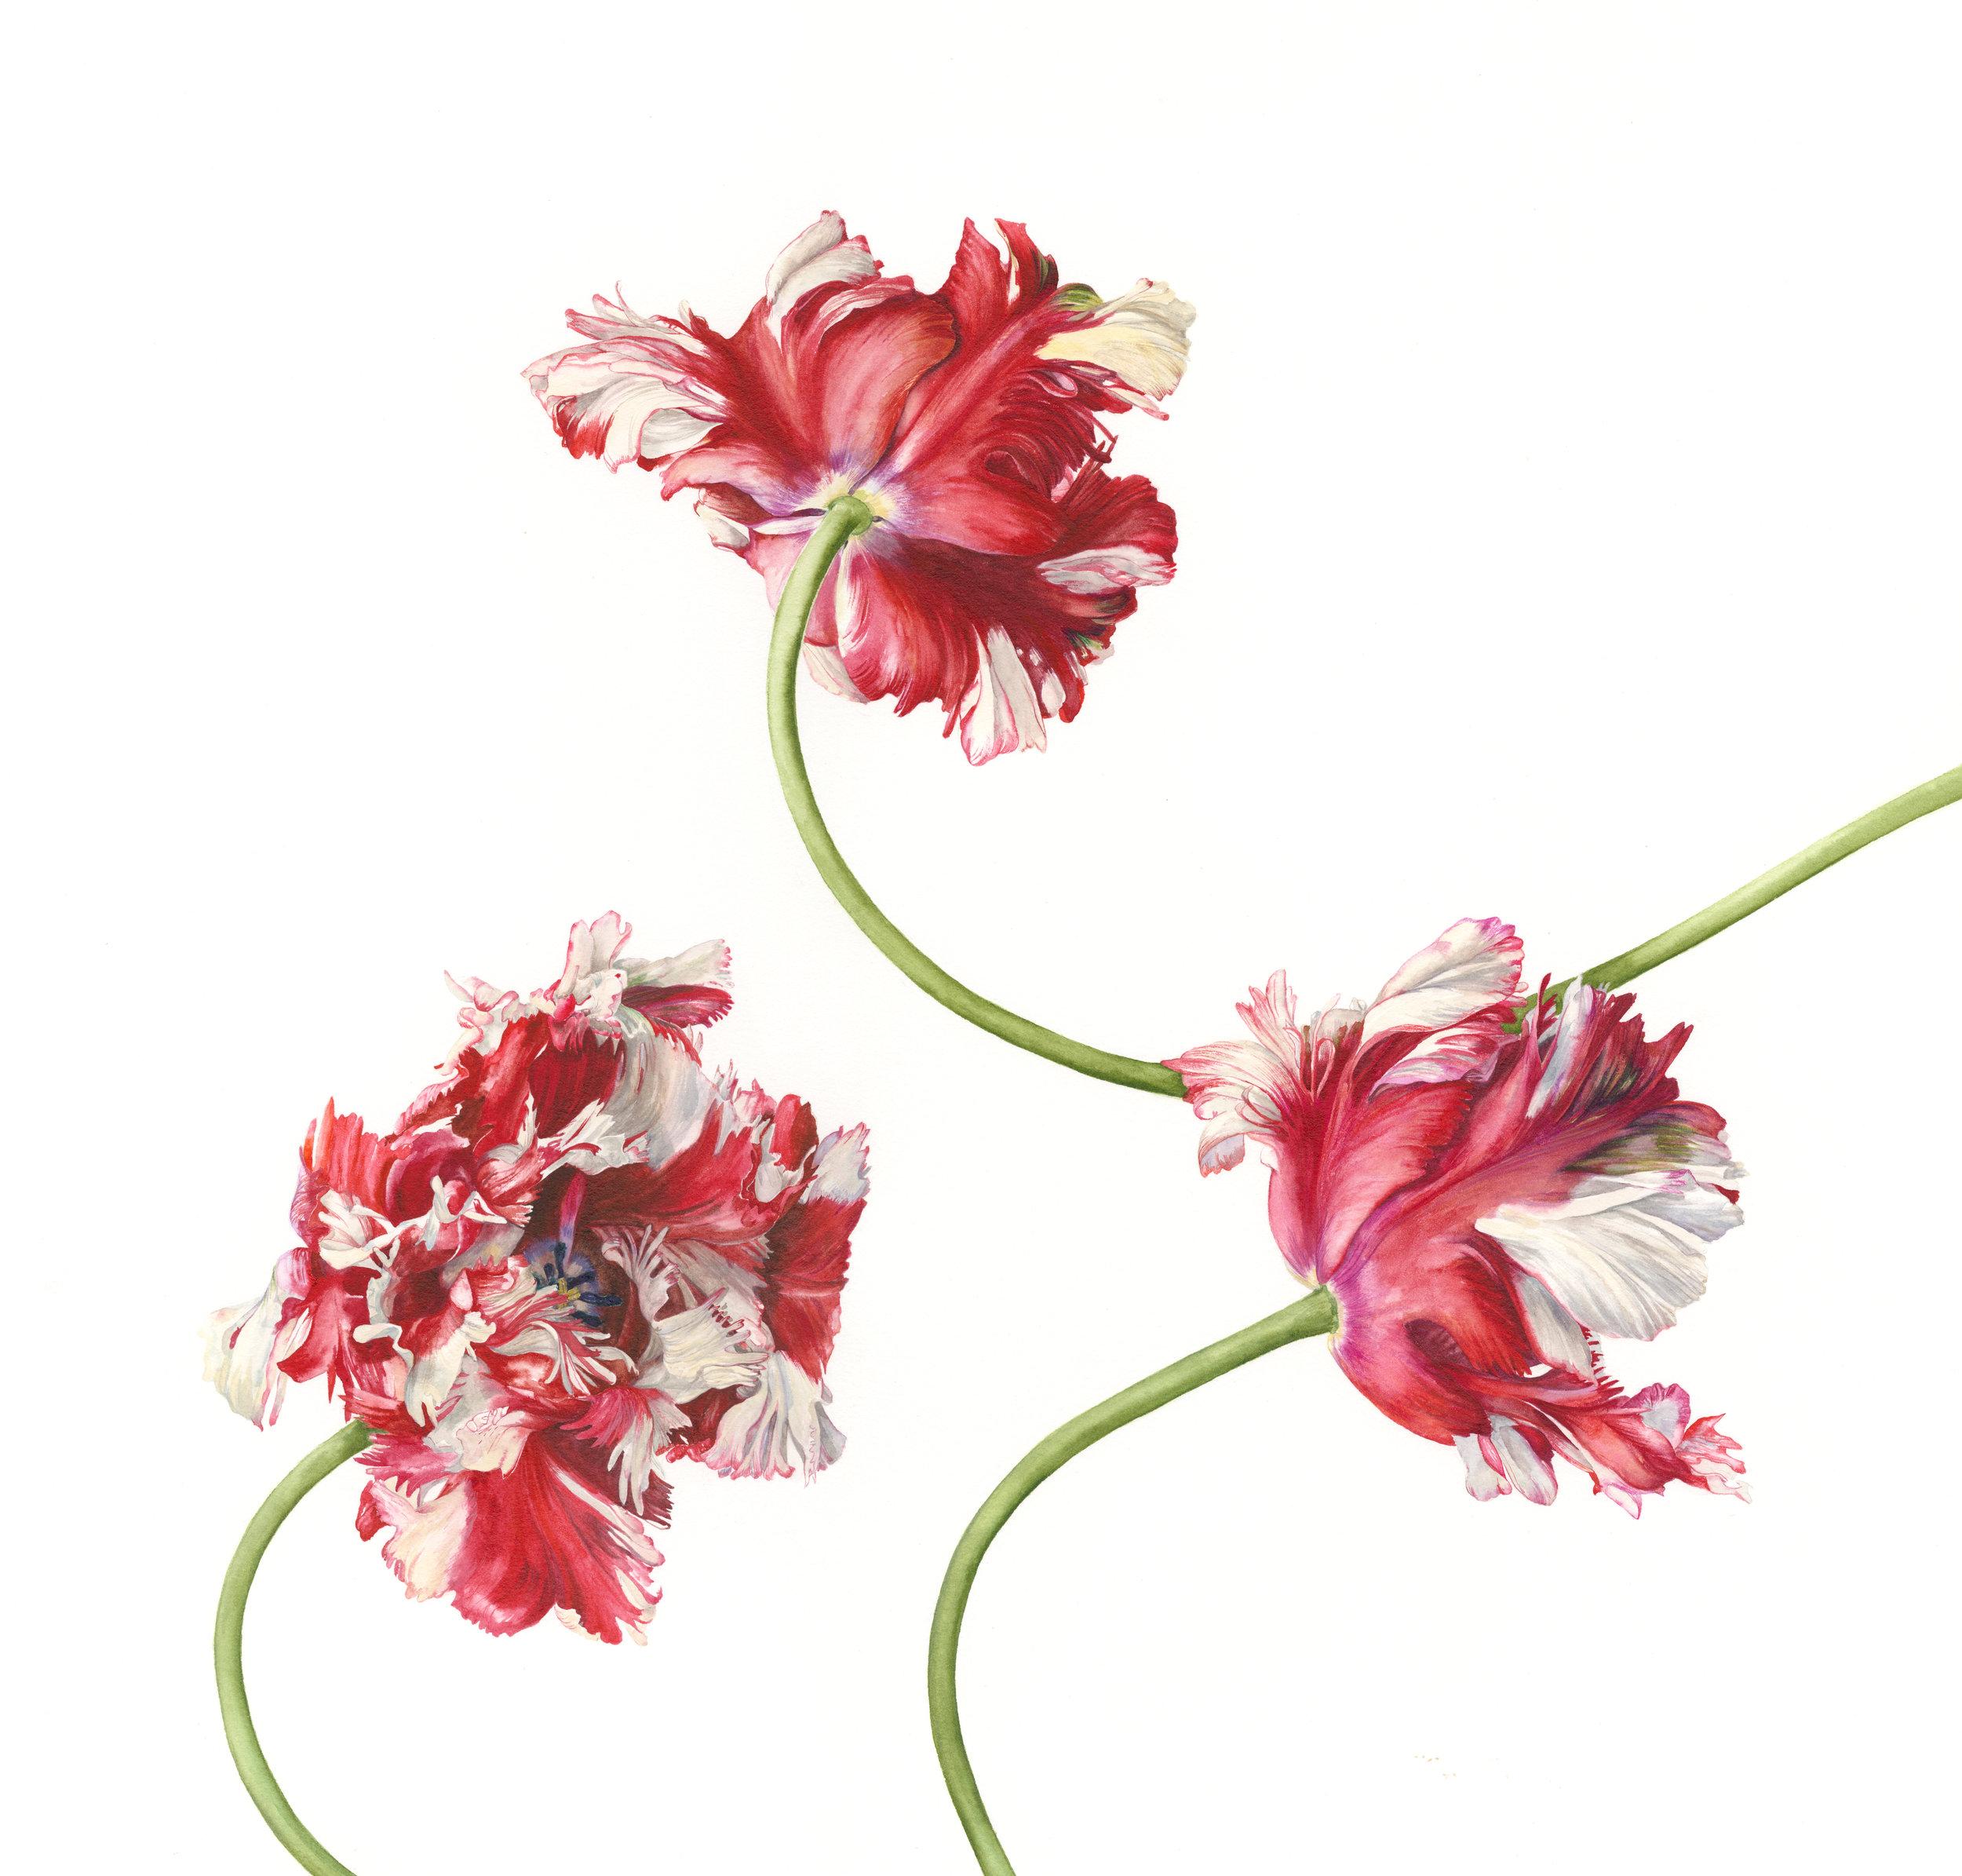 Tulipa Trio II 'Estella Rijnveld'  watercolour on paper  40 x 44 cm image  63 x 67 cm framed  £1800